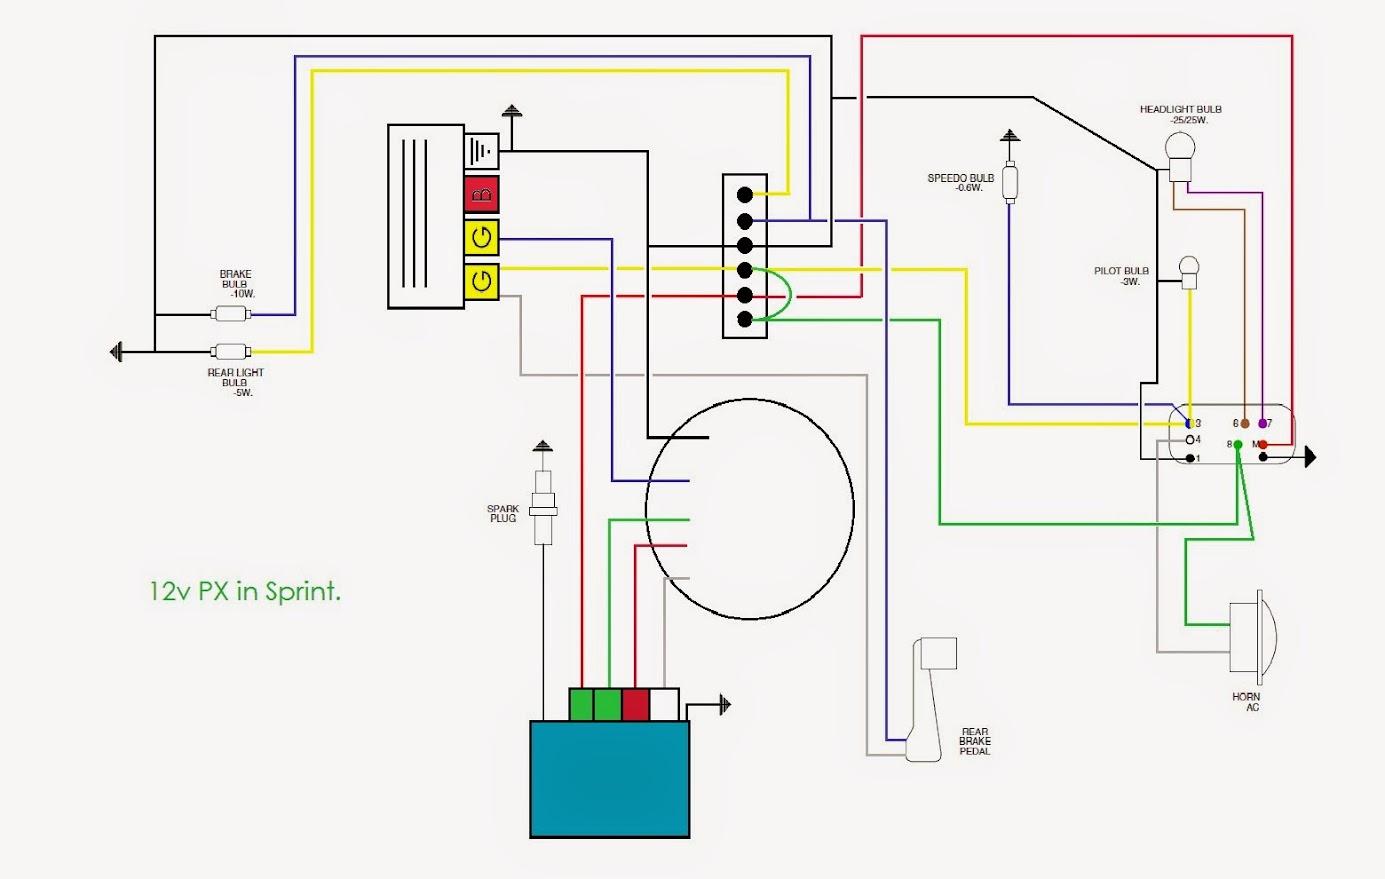 150cc Engine Wiring Diagram Tank Atv